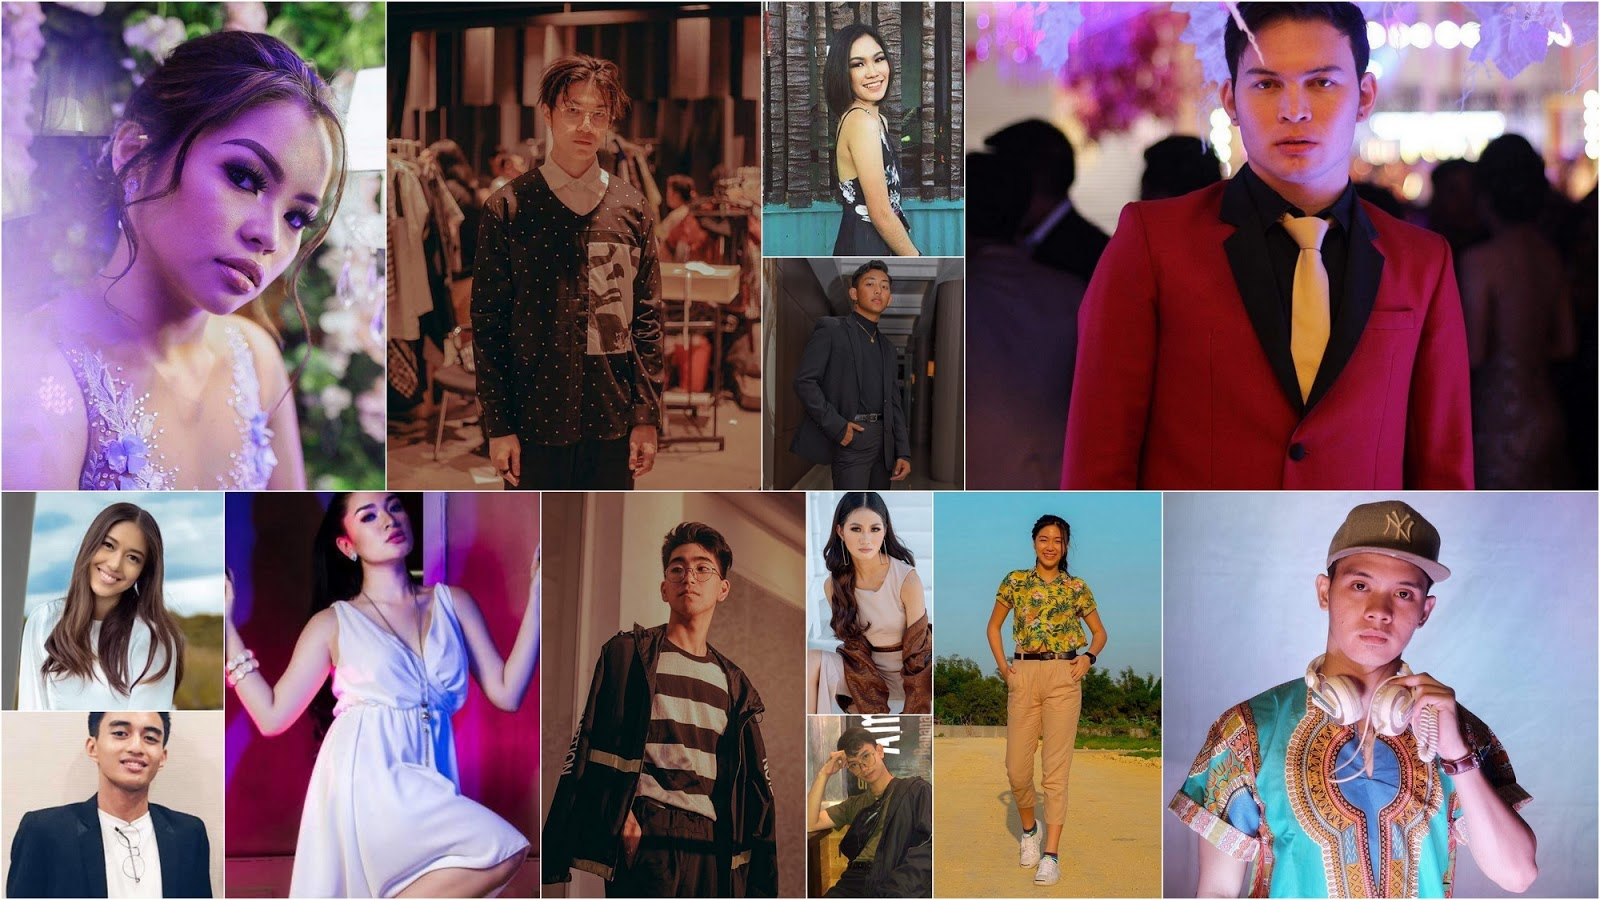 SM City Iloilo Fashion Nomads 2019 models